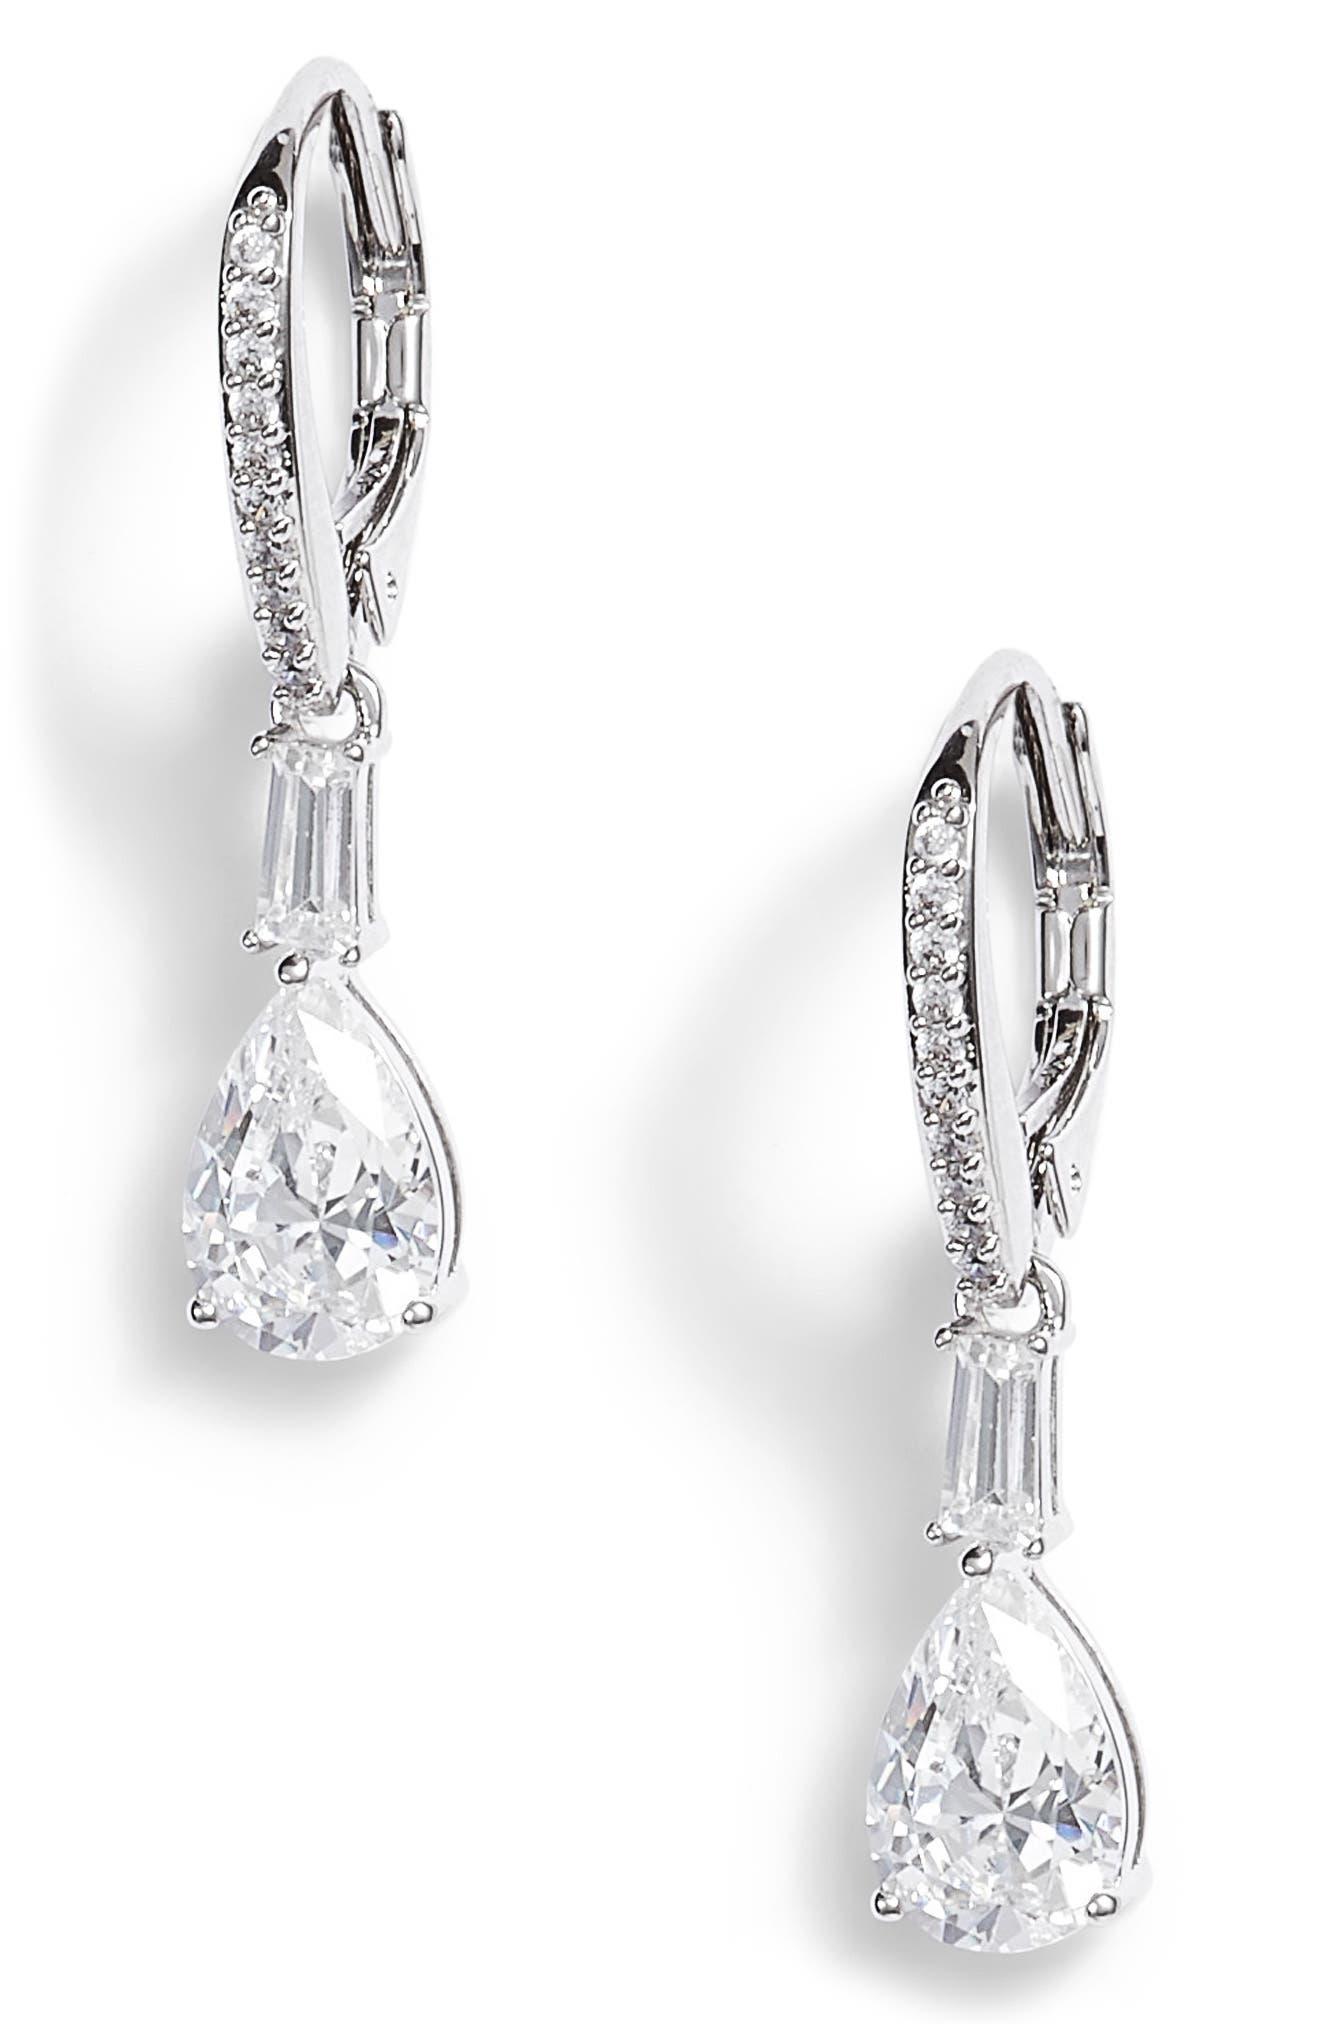 Fanfare Cubic Zirconia Drop Earrings,                             Main thumbnail 1, color,                             Silver